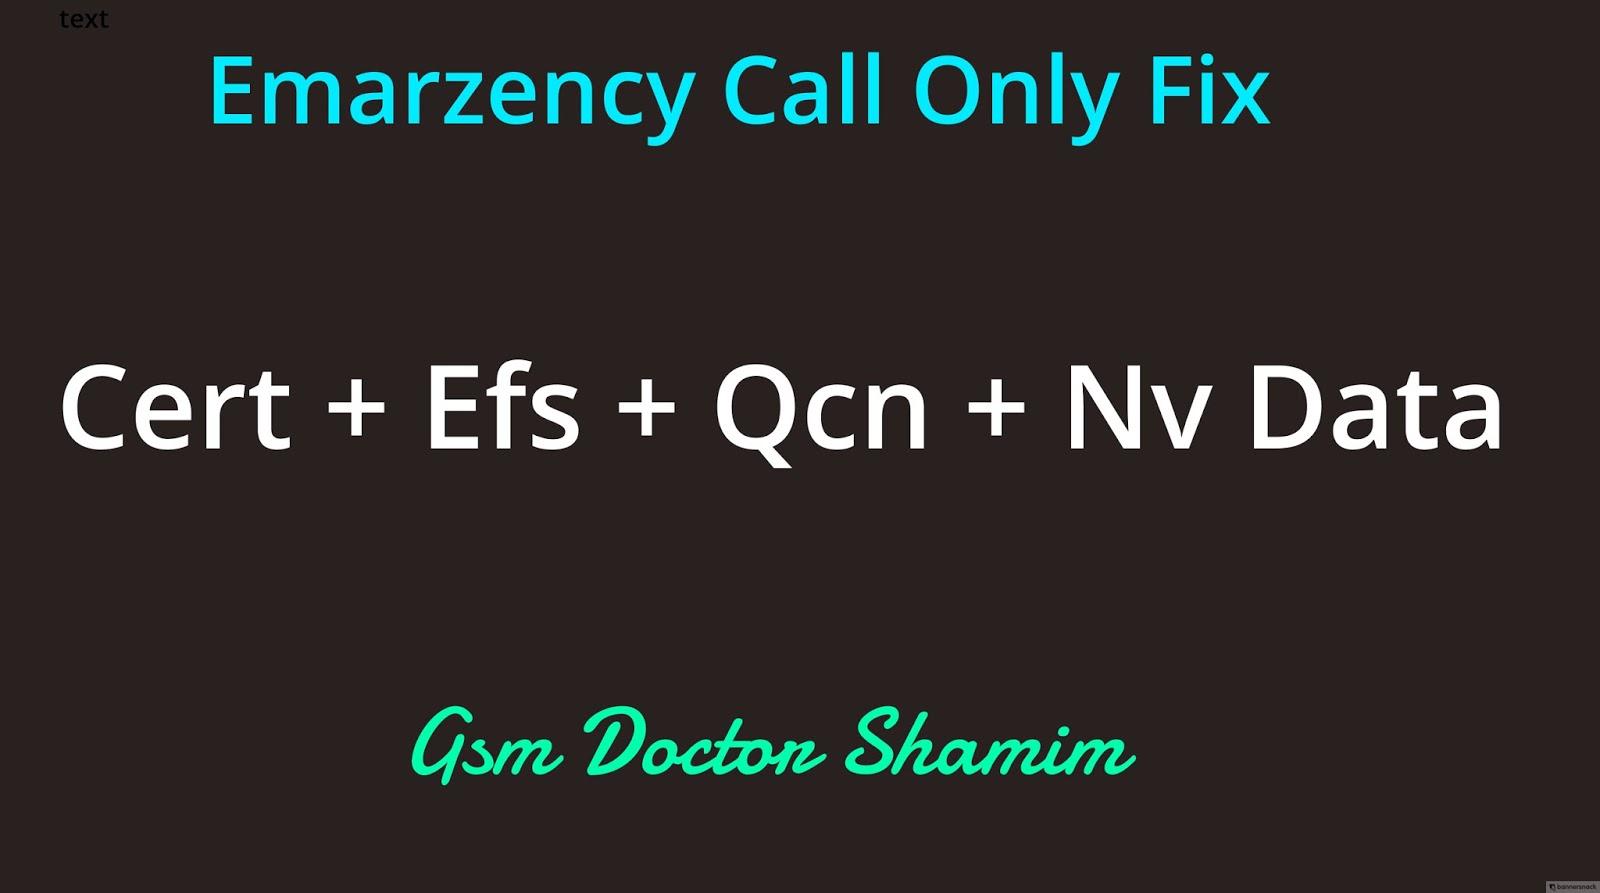 Samsung G570F cert+efs+nv data+pit - no service+emergency call only+